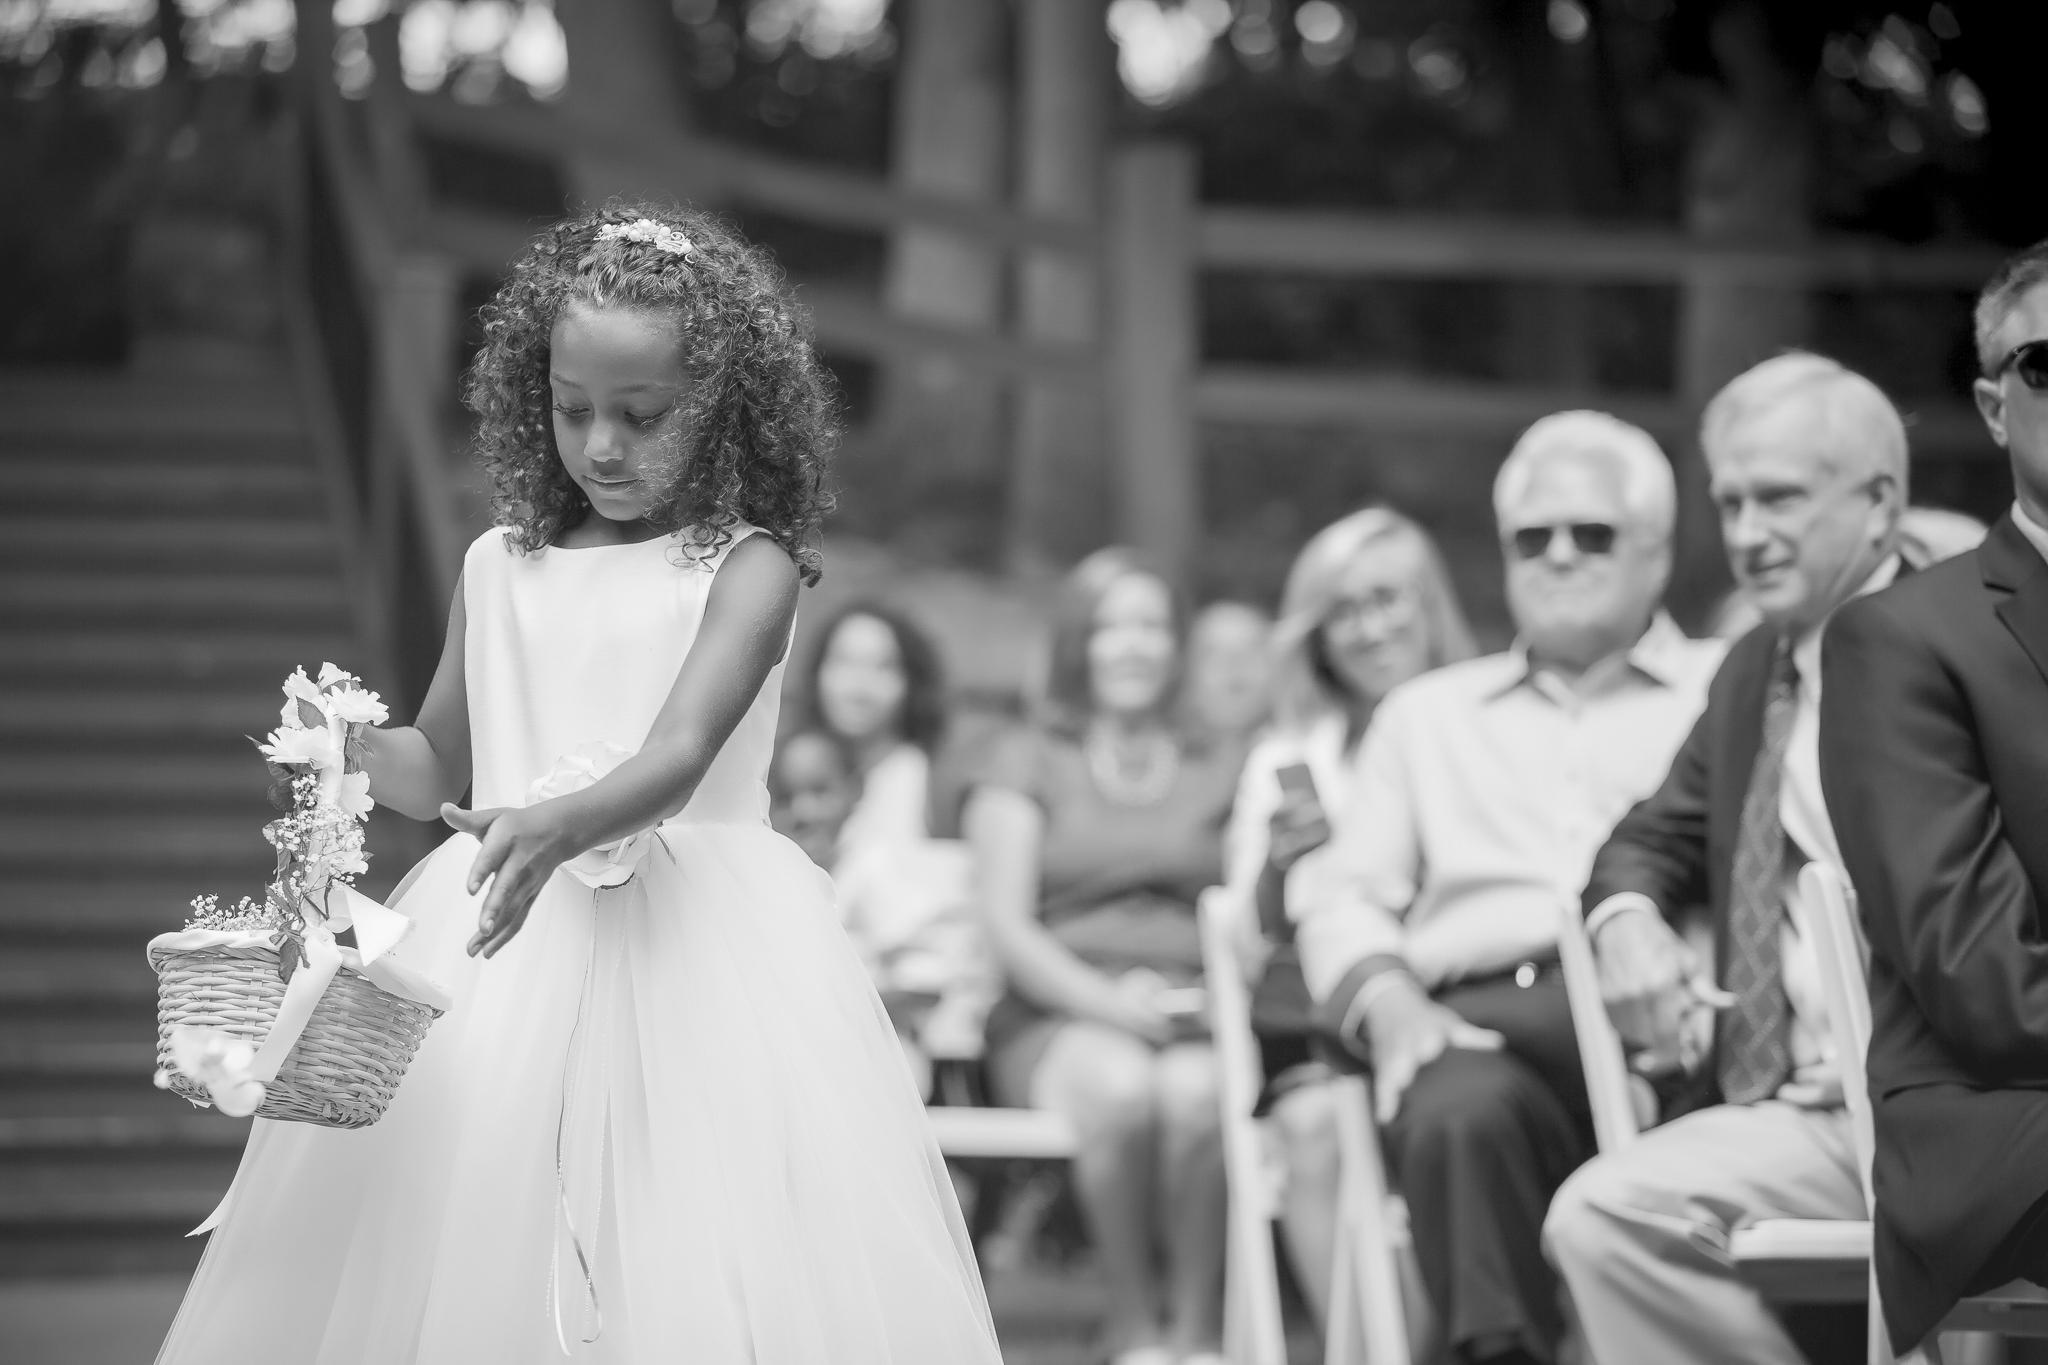 james j hill library wedding photography-10.jpg